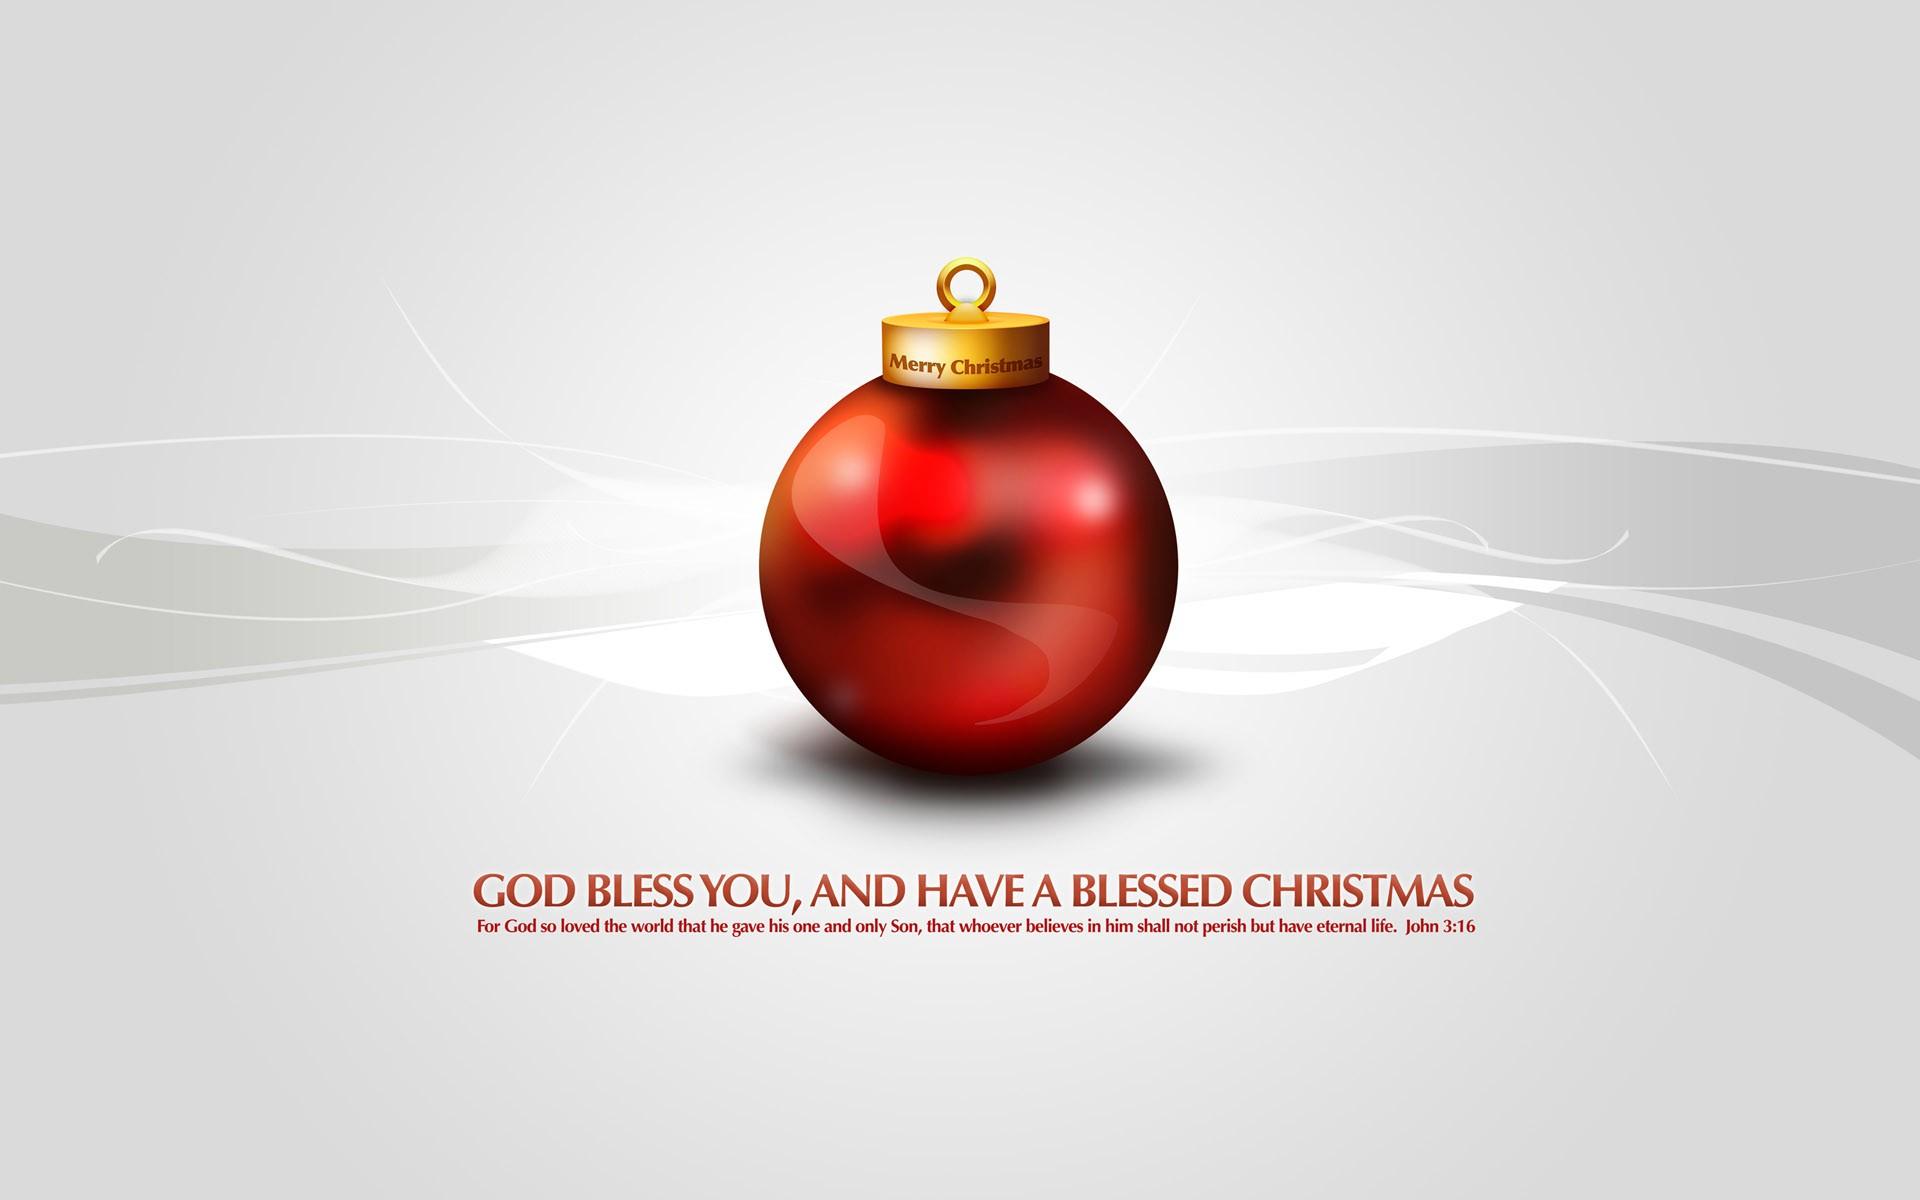 3d Glass Full Hd Wallpaper Merry Christmas God Bless You Wallpapers Hd Wallpapers